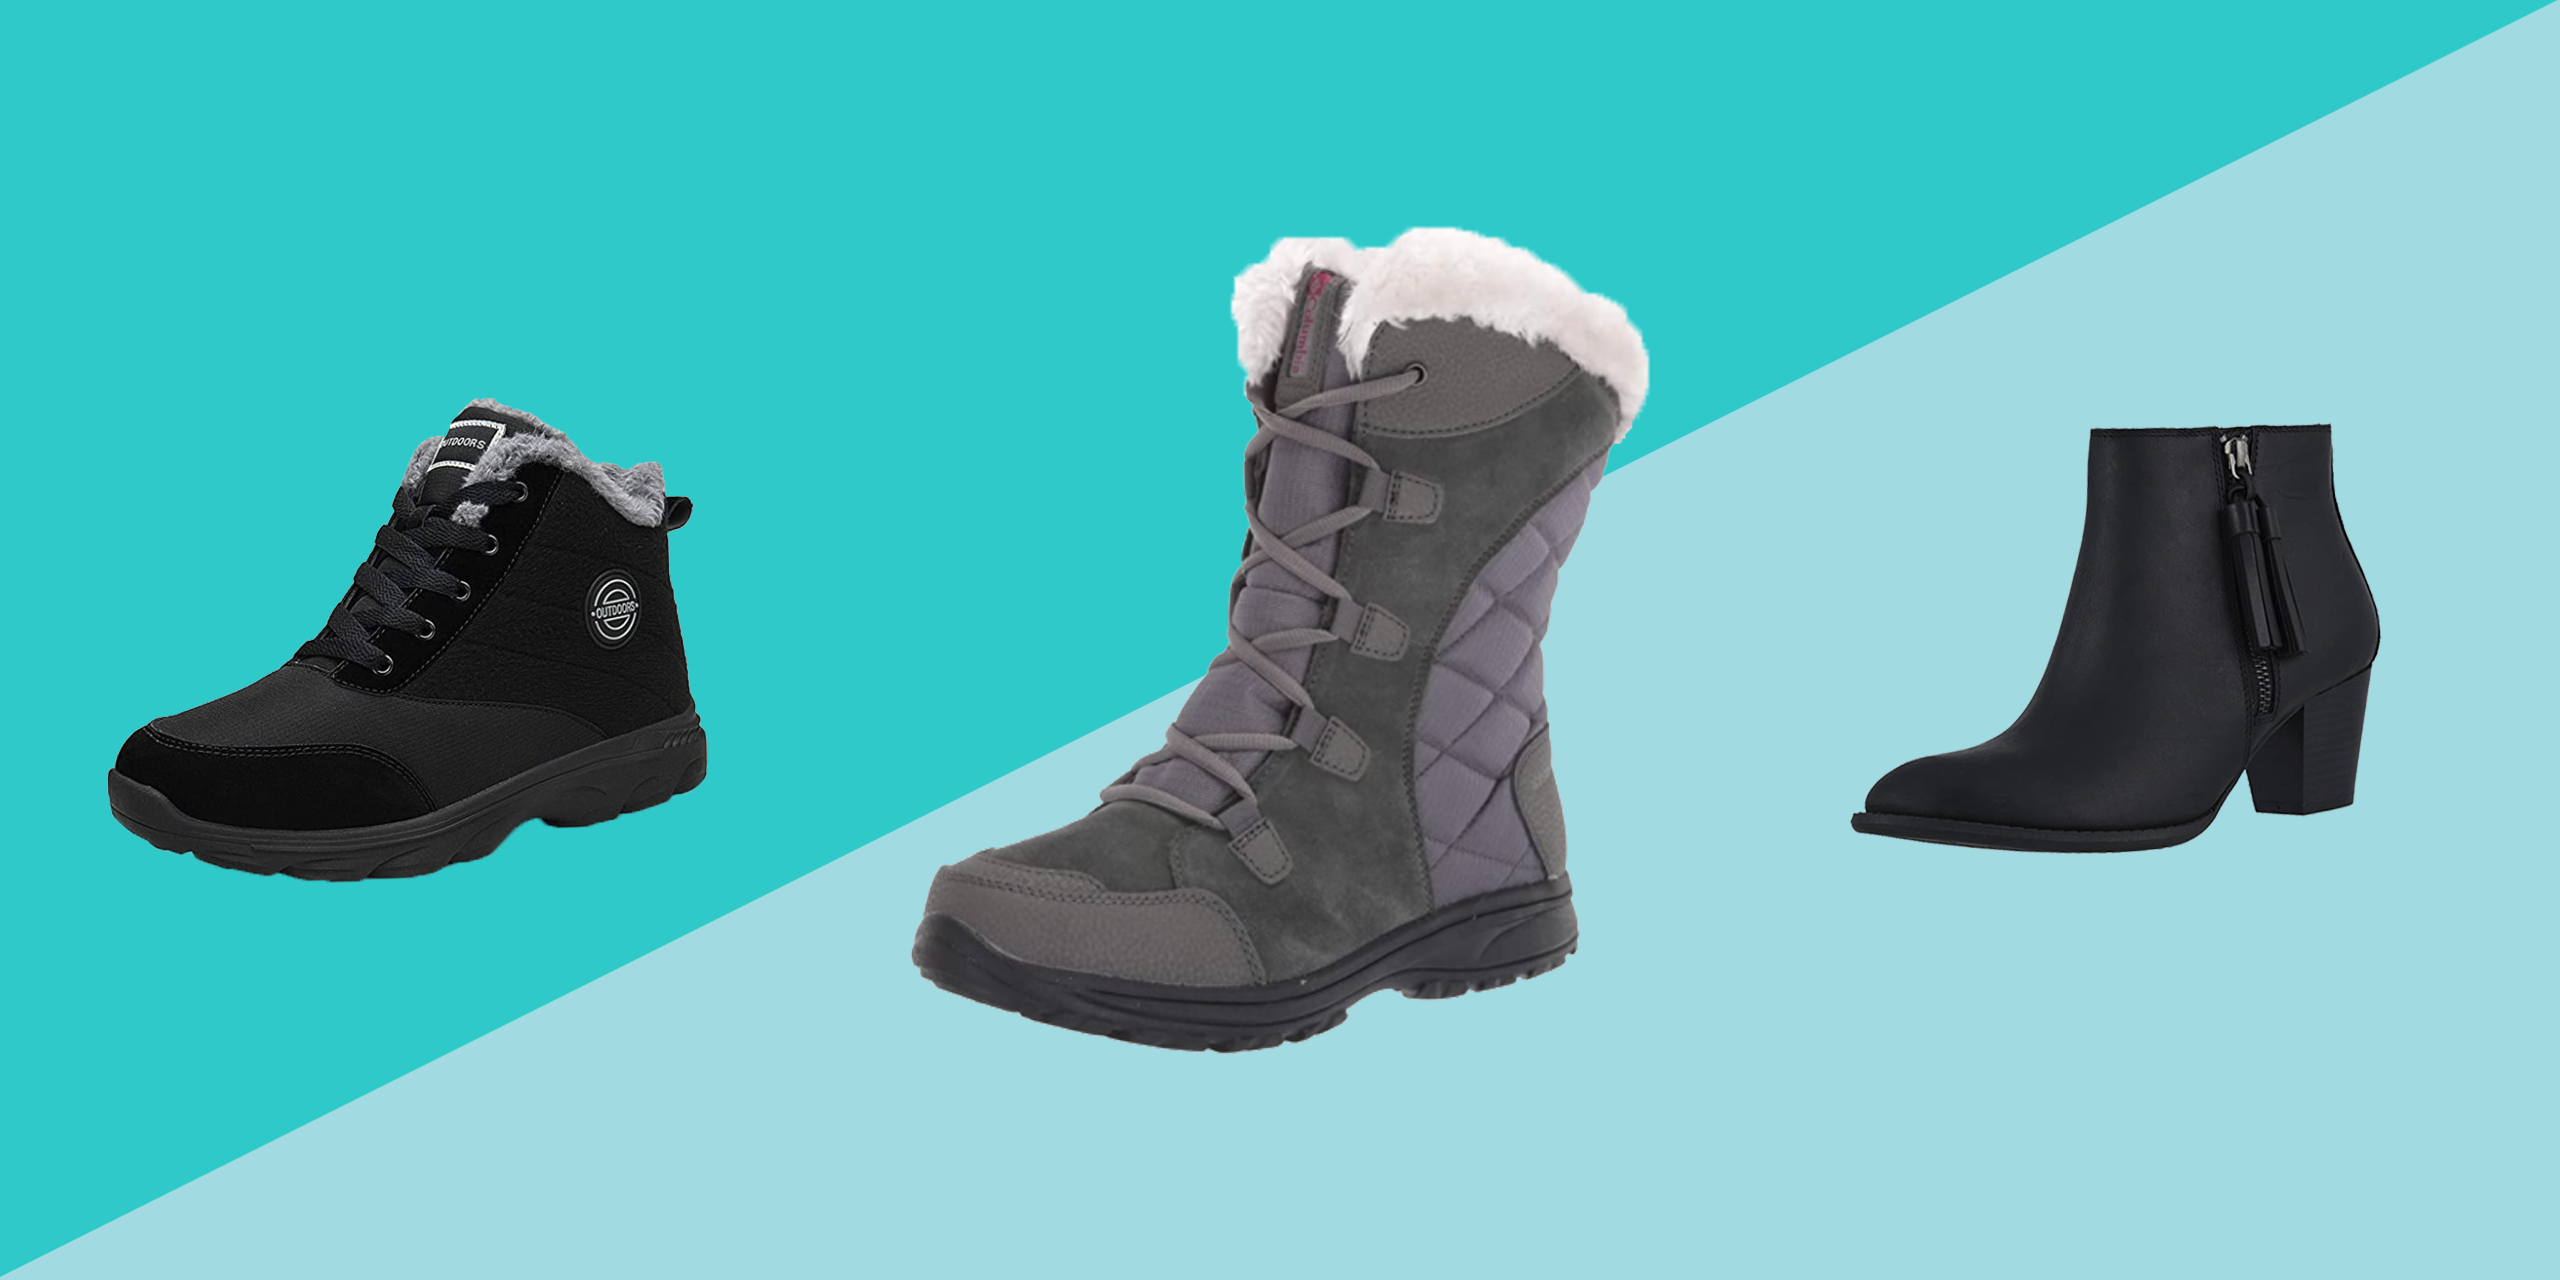 13 Best Winter Shoe Deals for Amazon